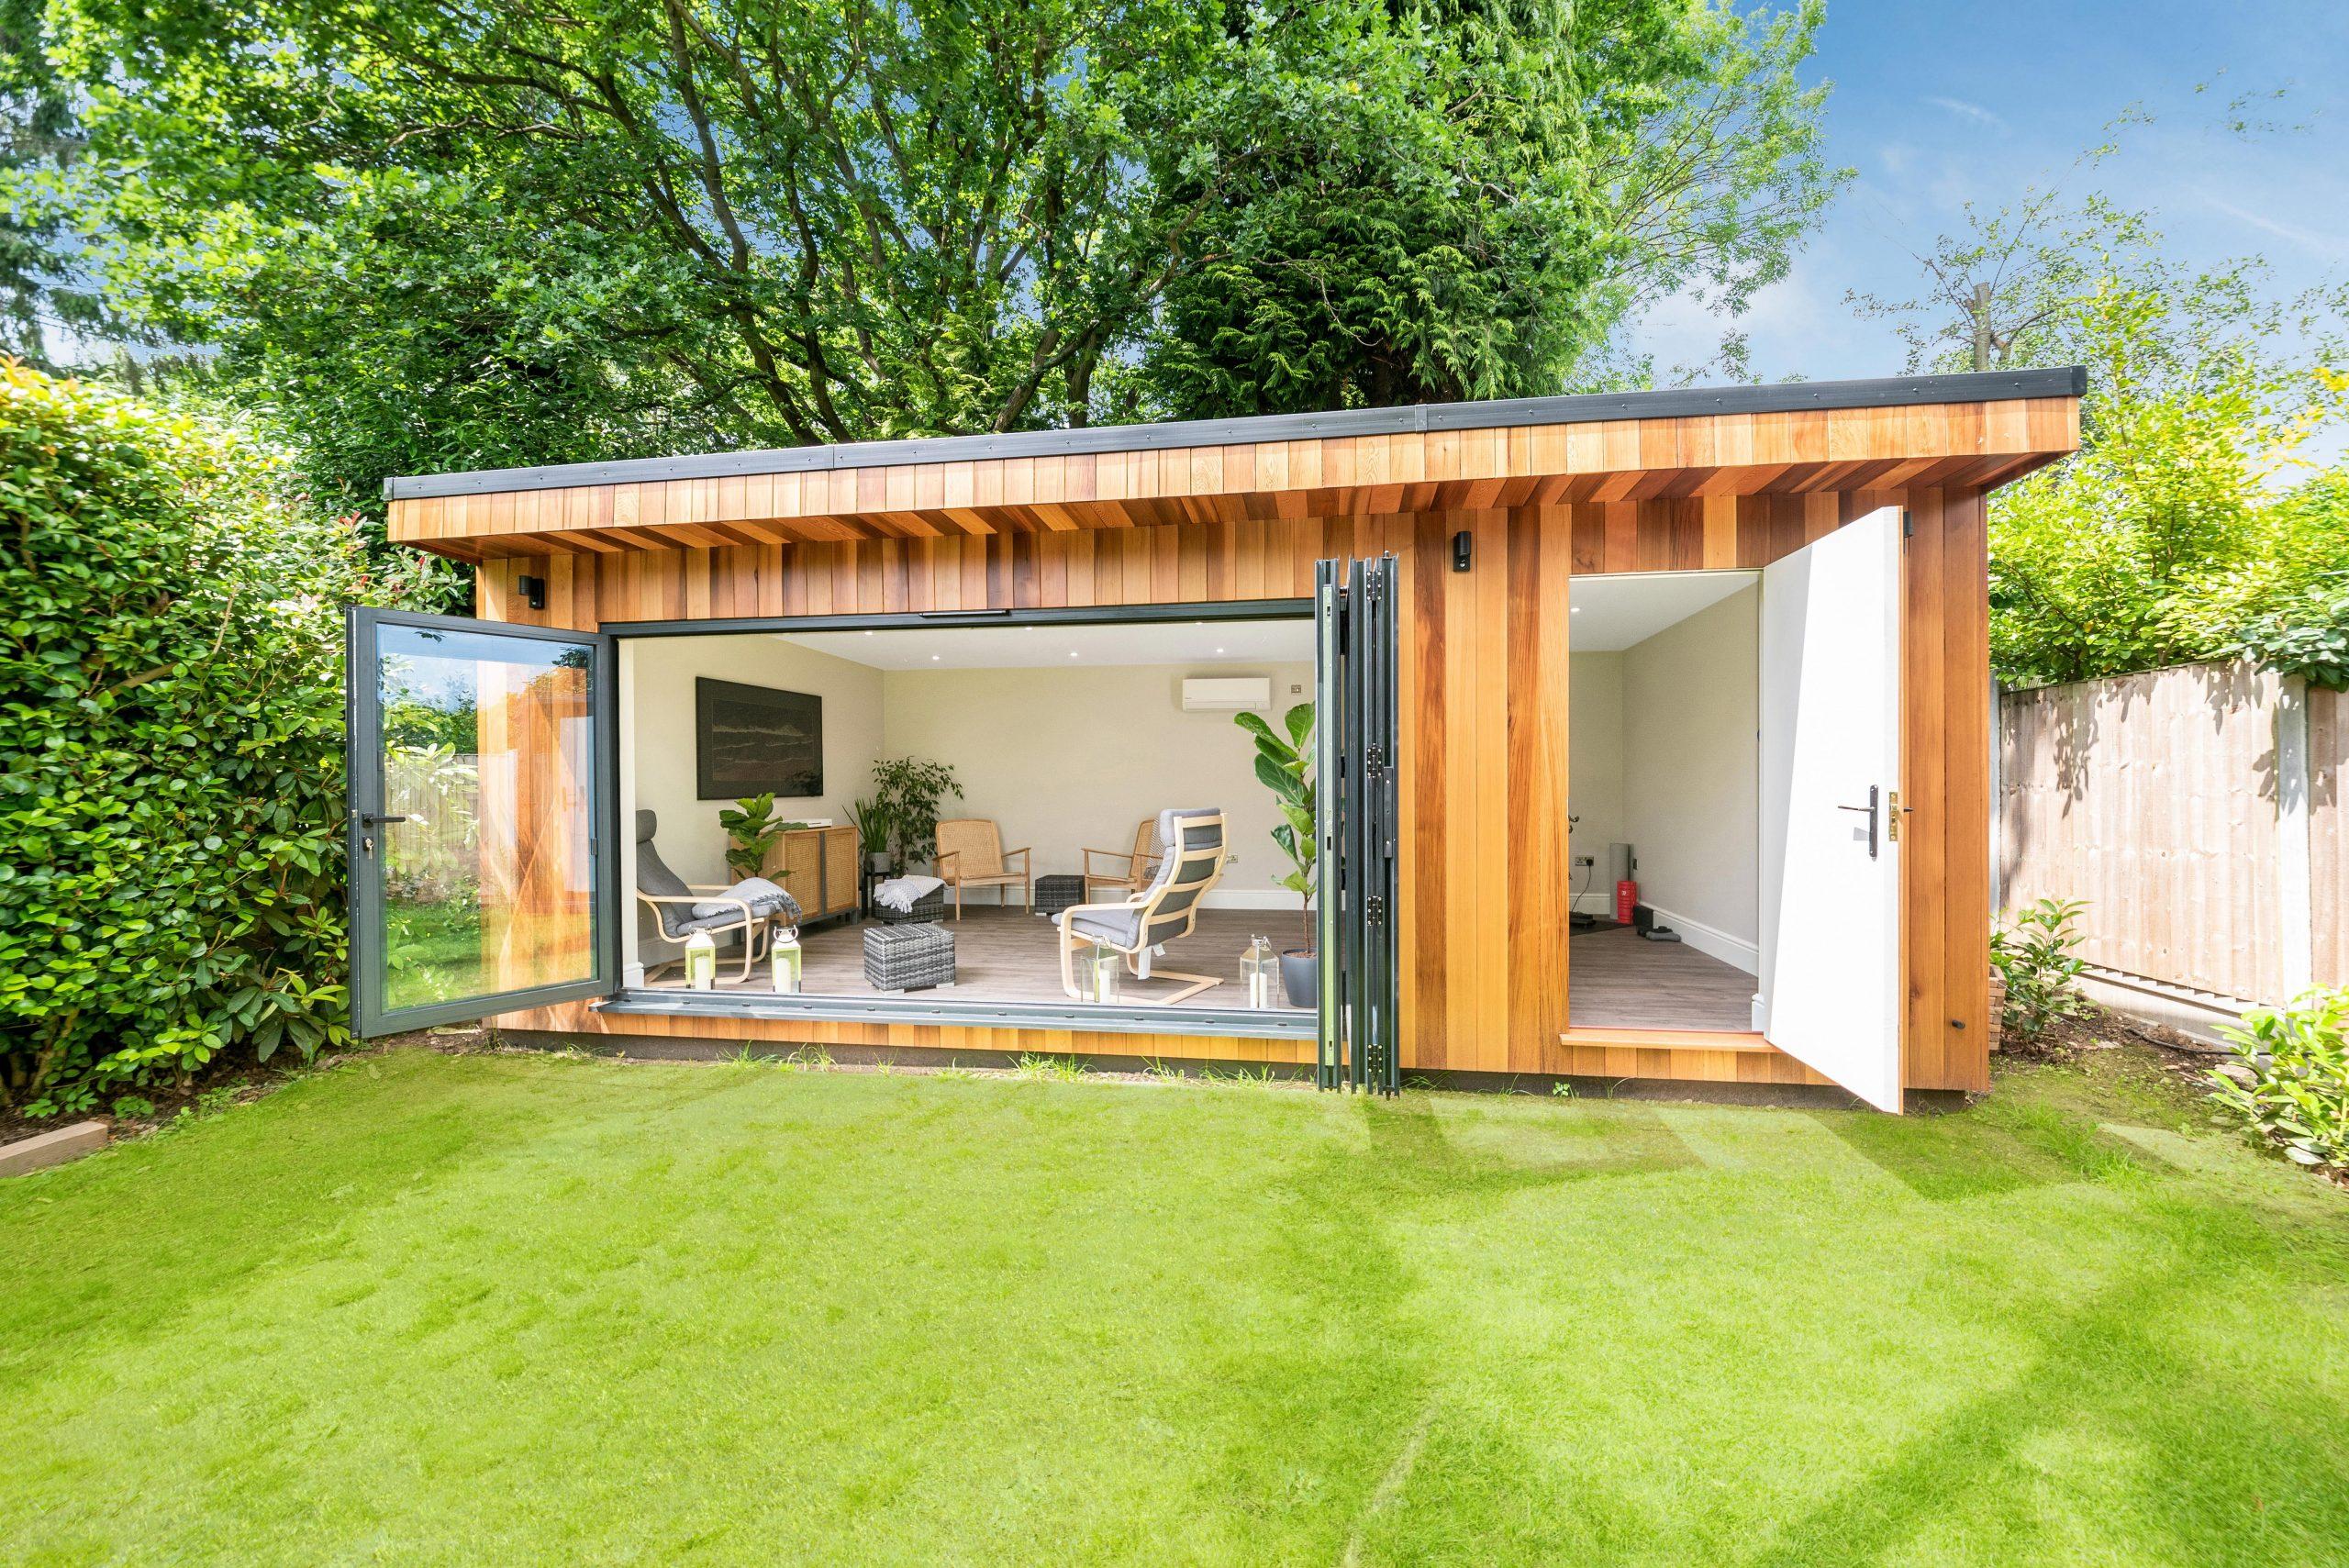 Luxuyr garden studio in Essex